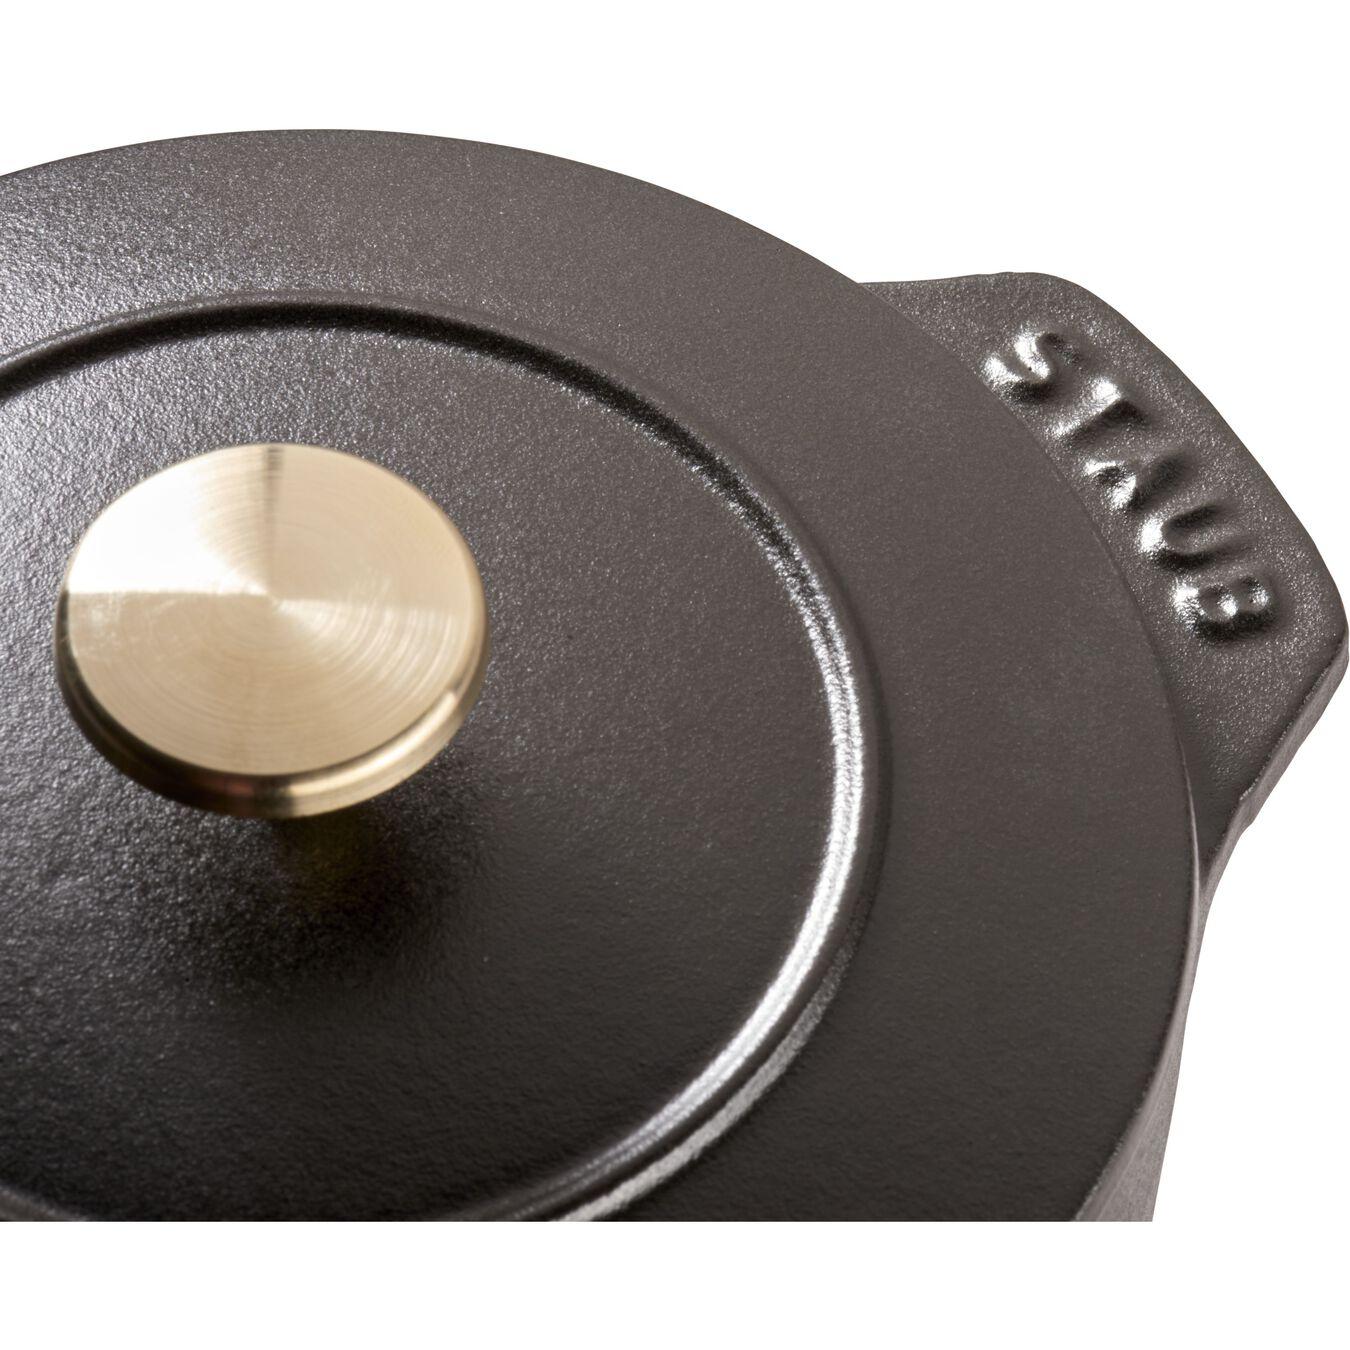 0.75-qt Petite French Oven - Matte Black,,large 3